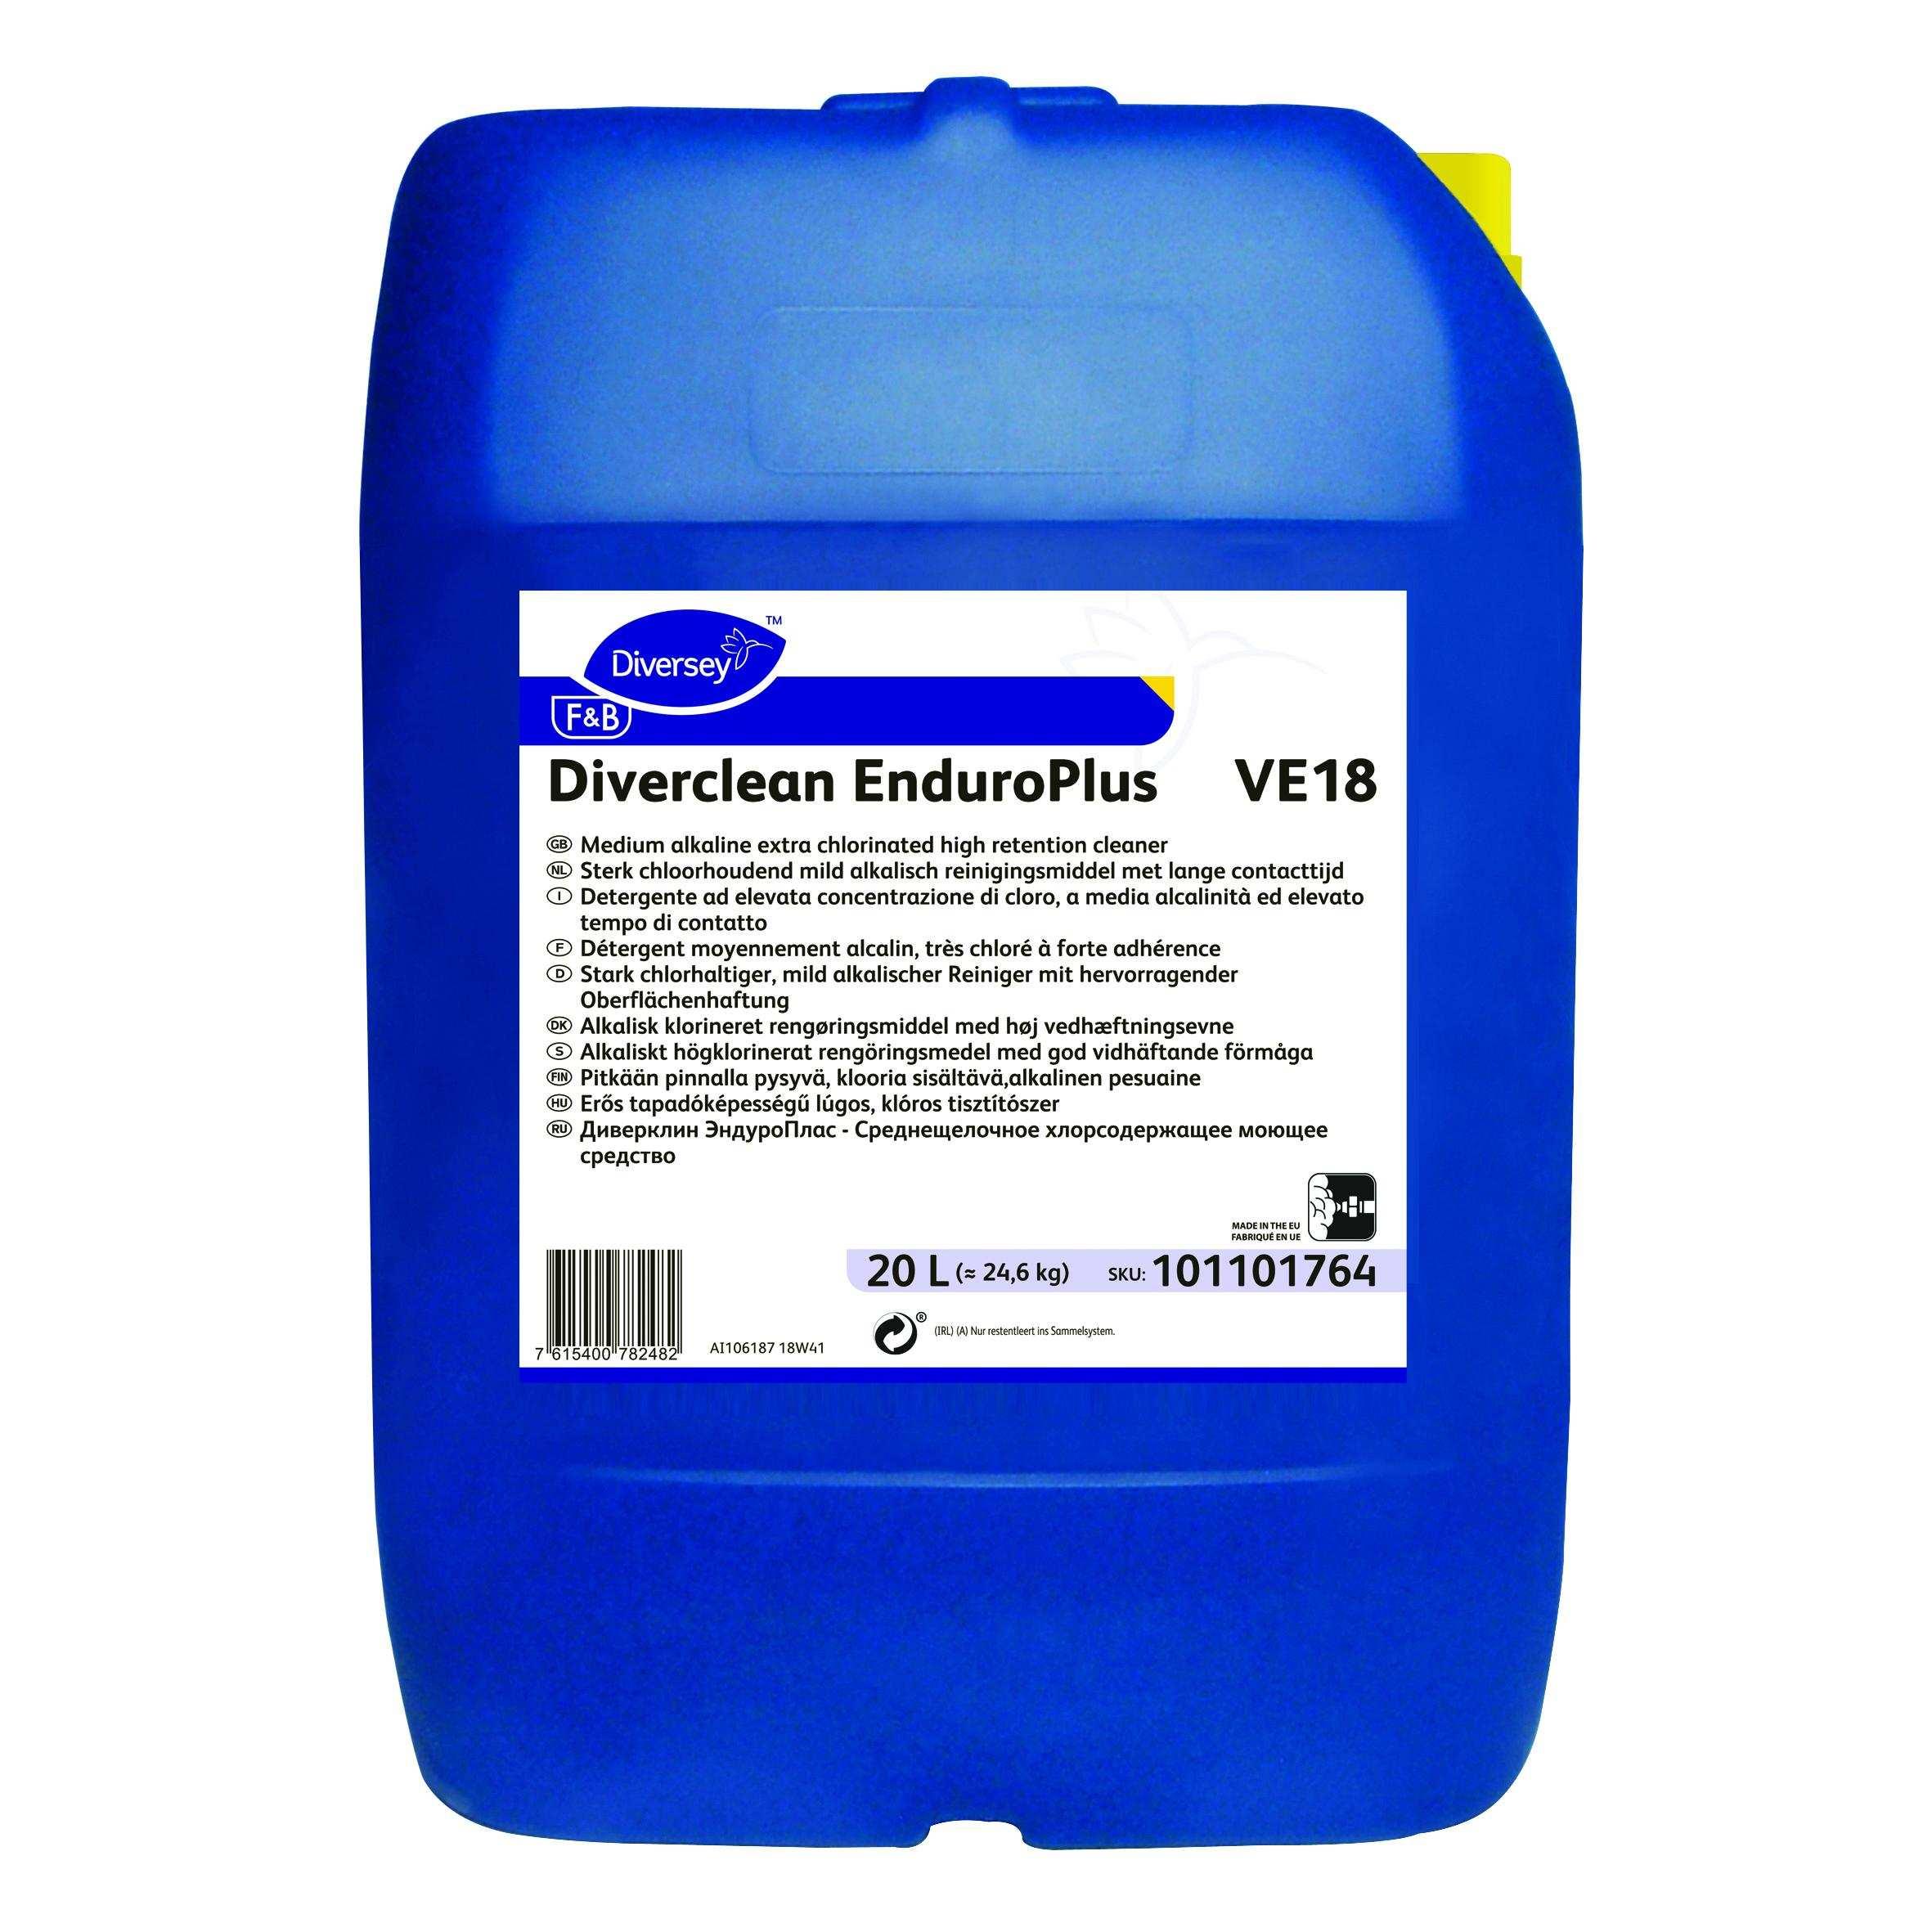 101101764-Diverclean-EnduroPlus-VE18-20L.jpg